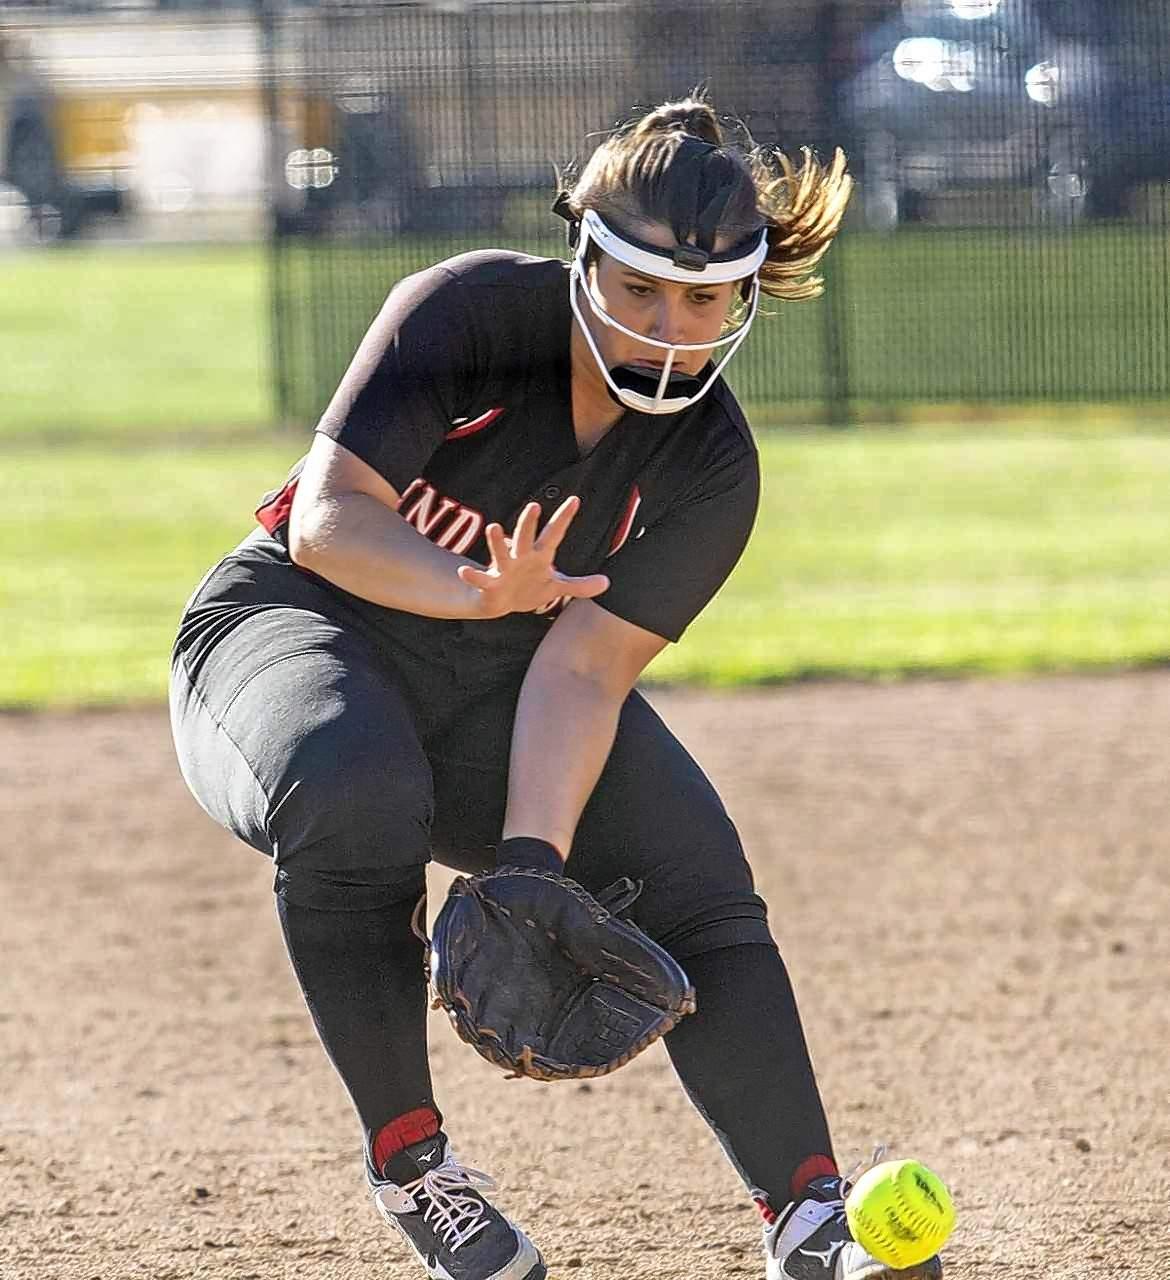 Lady Indians third baseman Morgan Bullar snags a grounder in Monday's game.